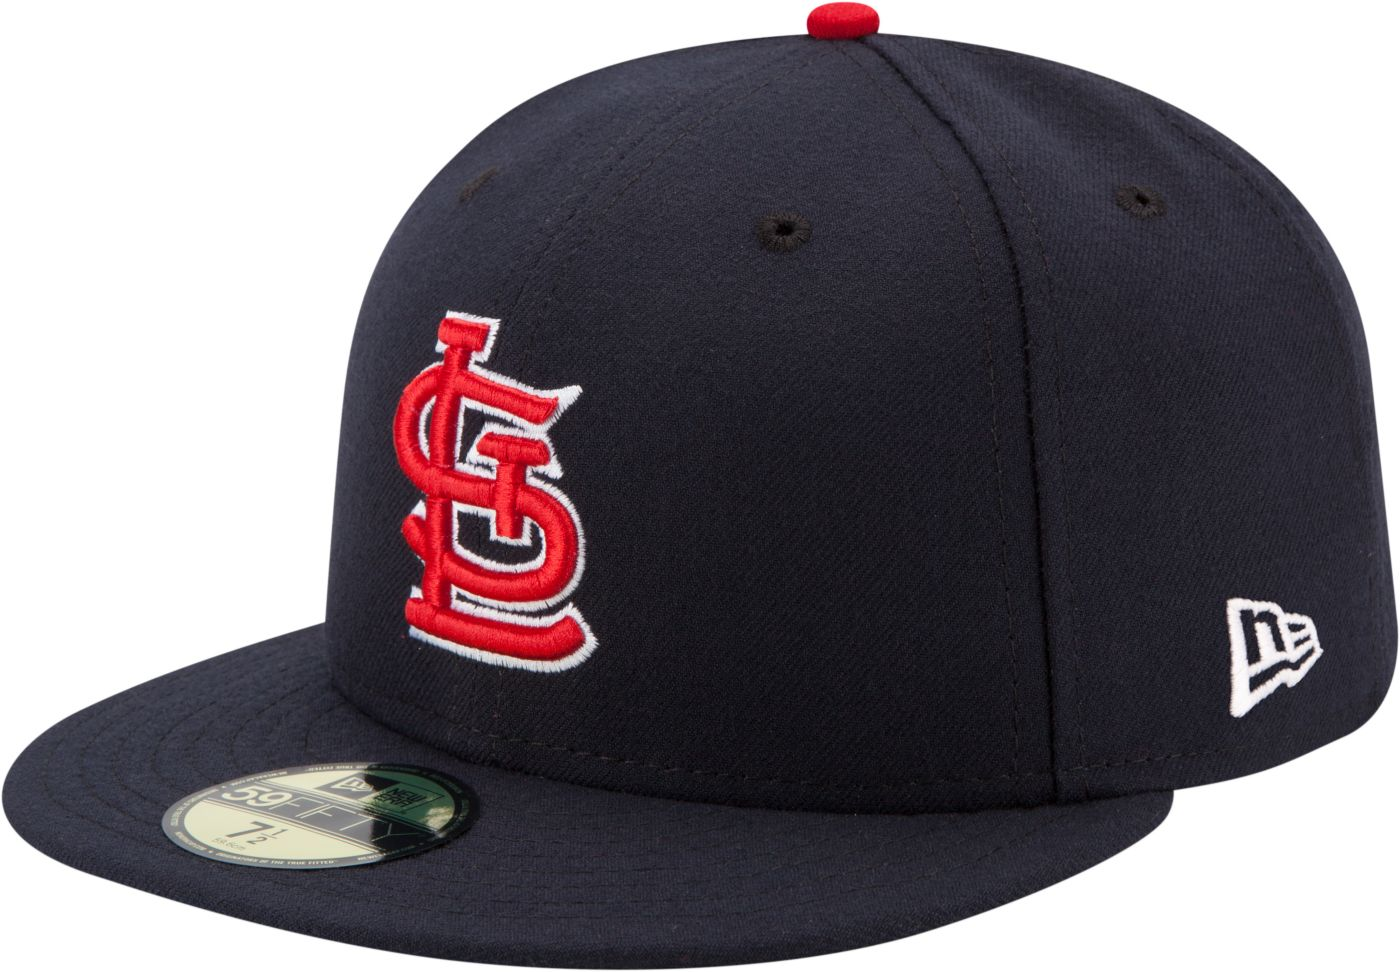 New Era Men's St. Louis Cardinals 59Fifty Alternate Navy Authentic Hat